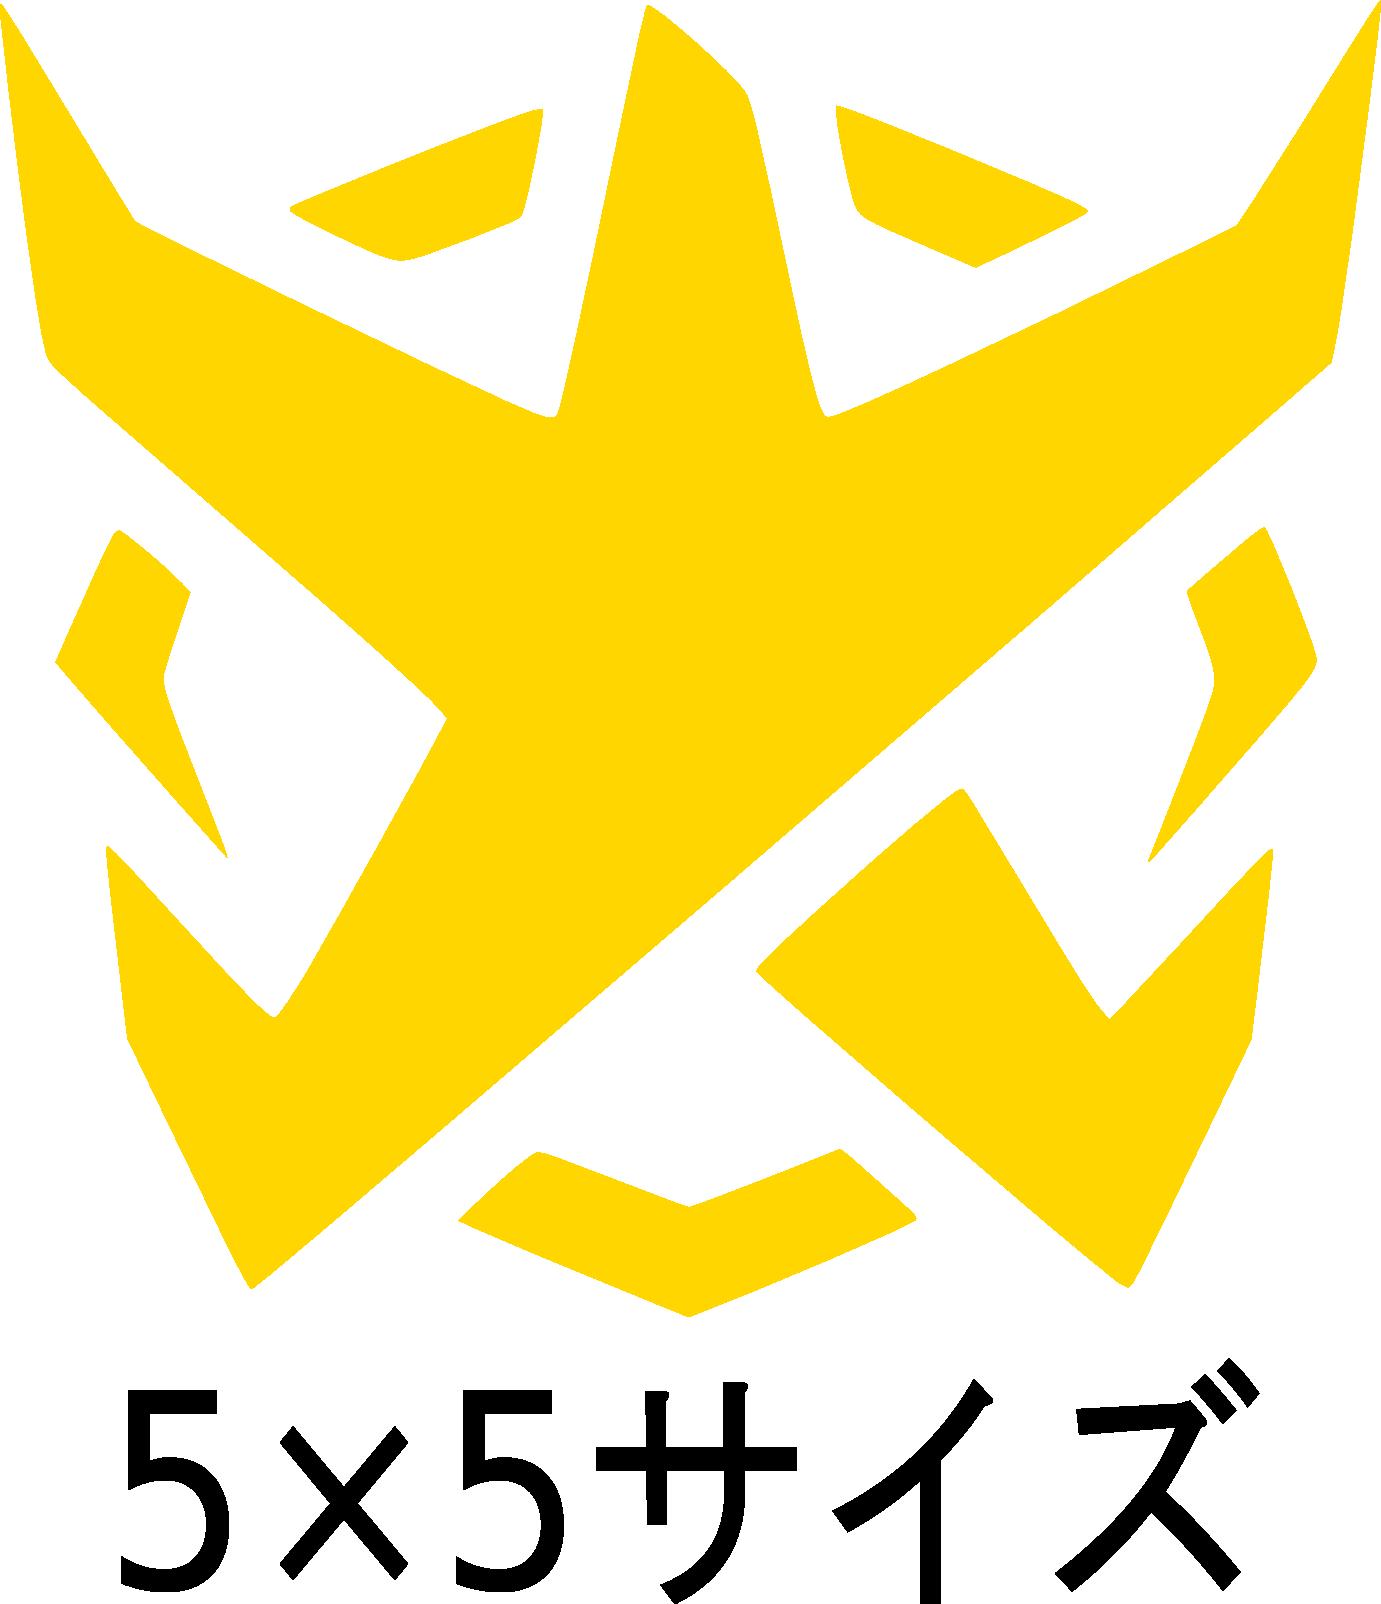 BADFALLロゴステッカー 黄5